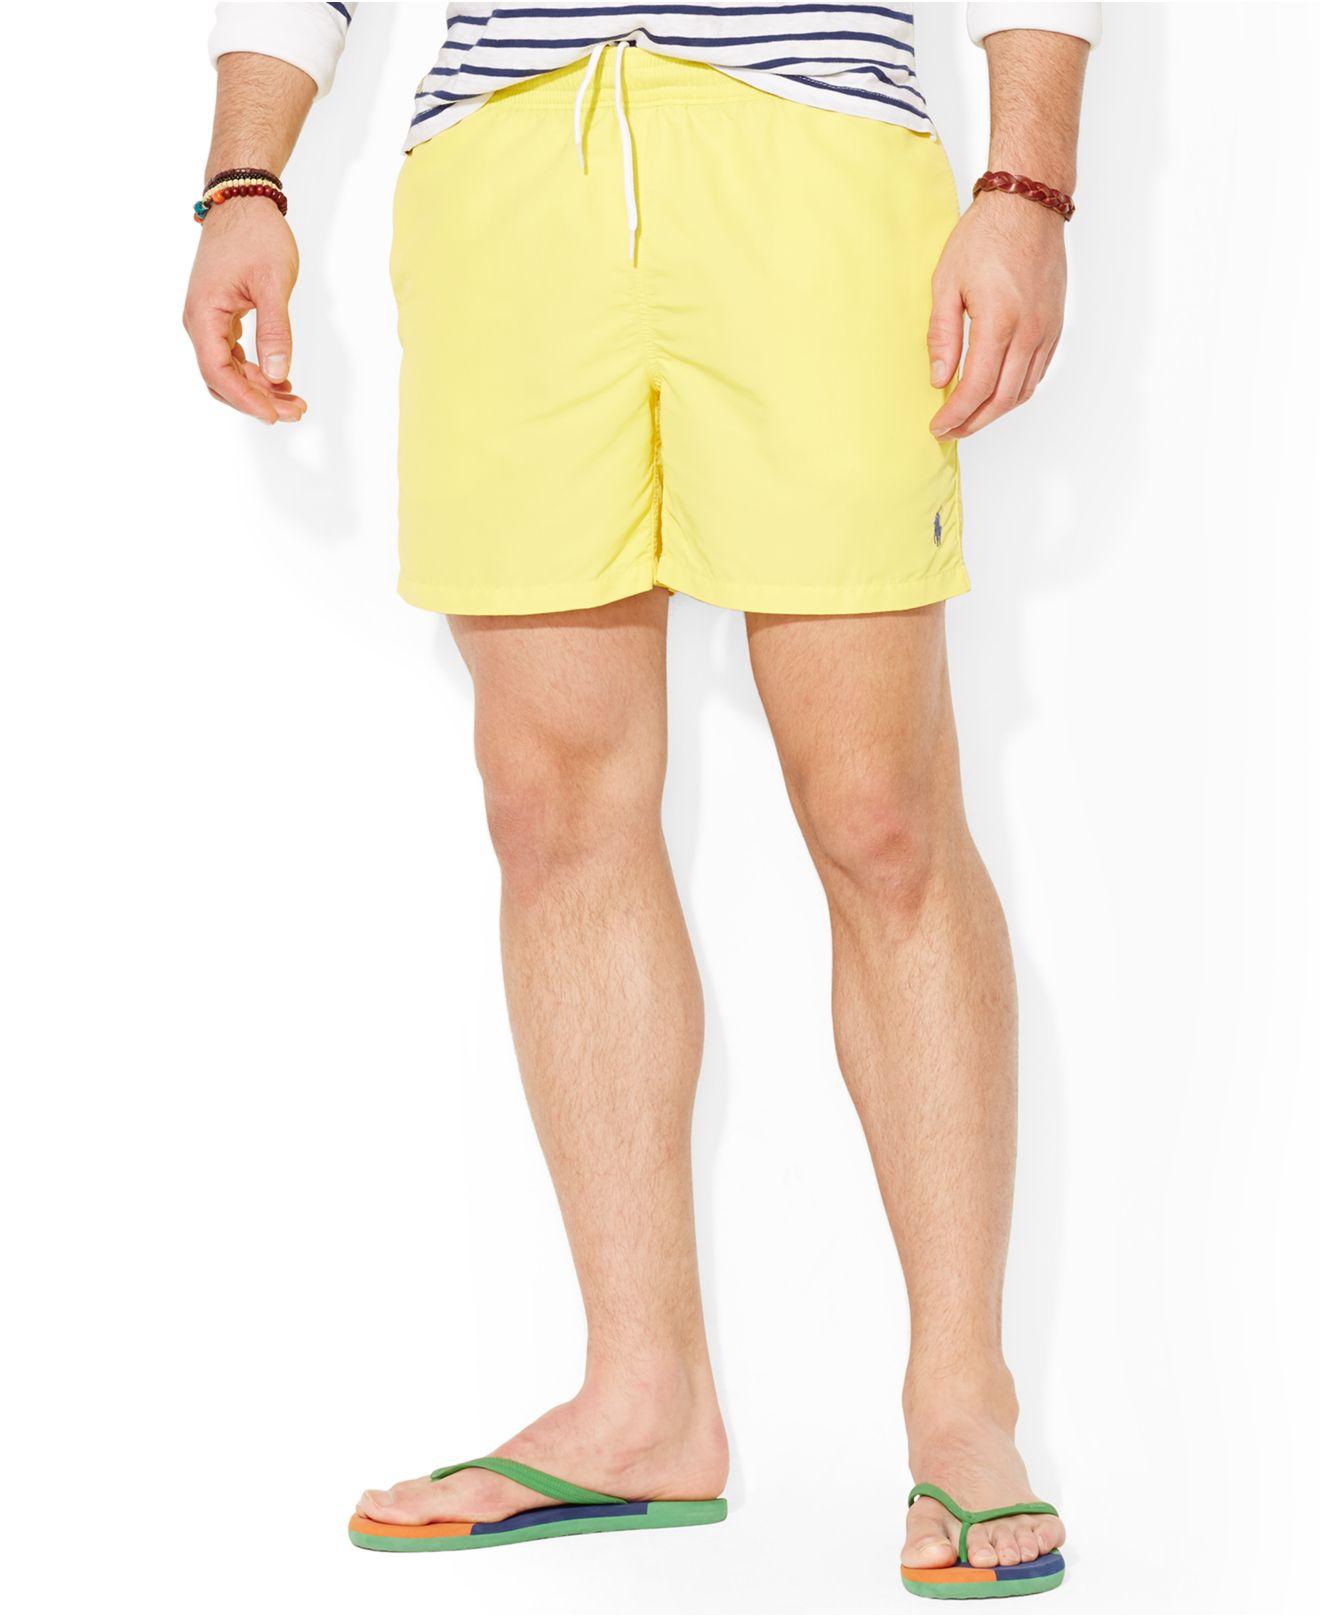 39aeee06396e2 ... germany lyst polo ralph lauren big and tall hawaiian swim shorts in  yellow 7e9bc bc943 ...